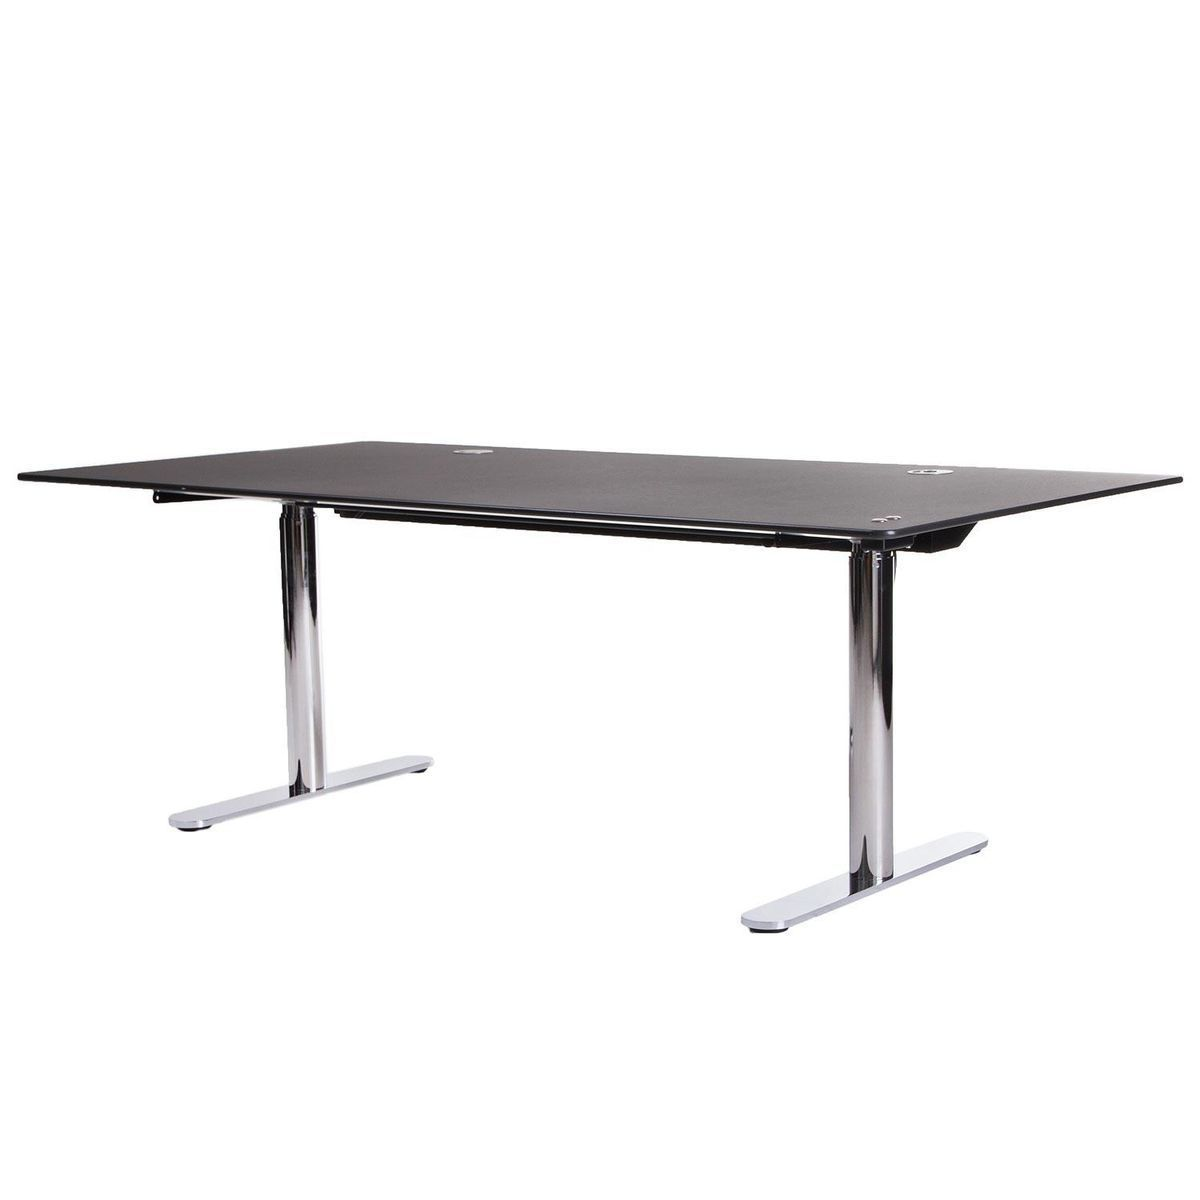 Ha2 Work Height Adjustable Office Table Montana